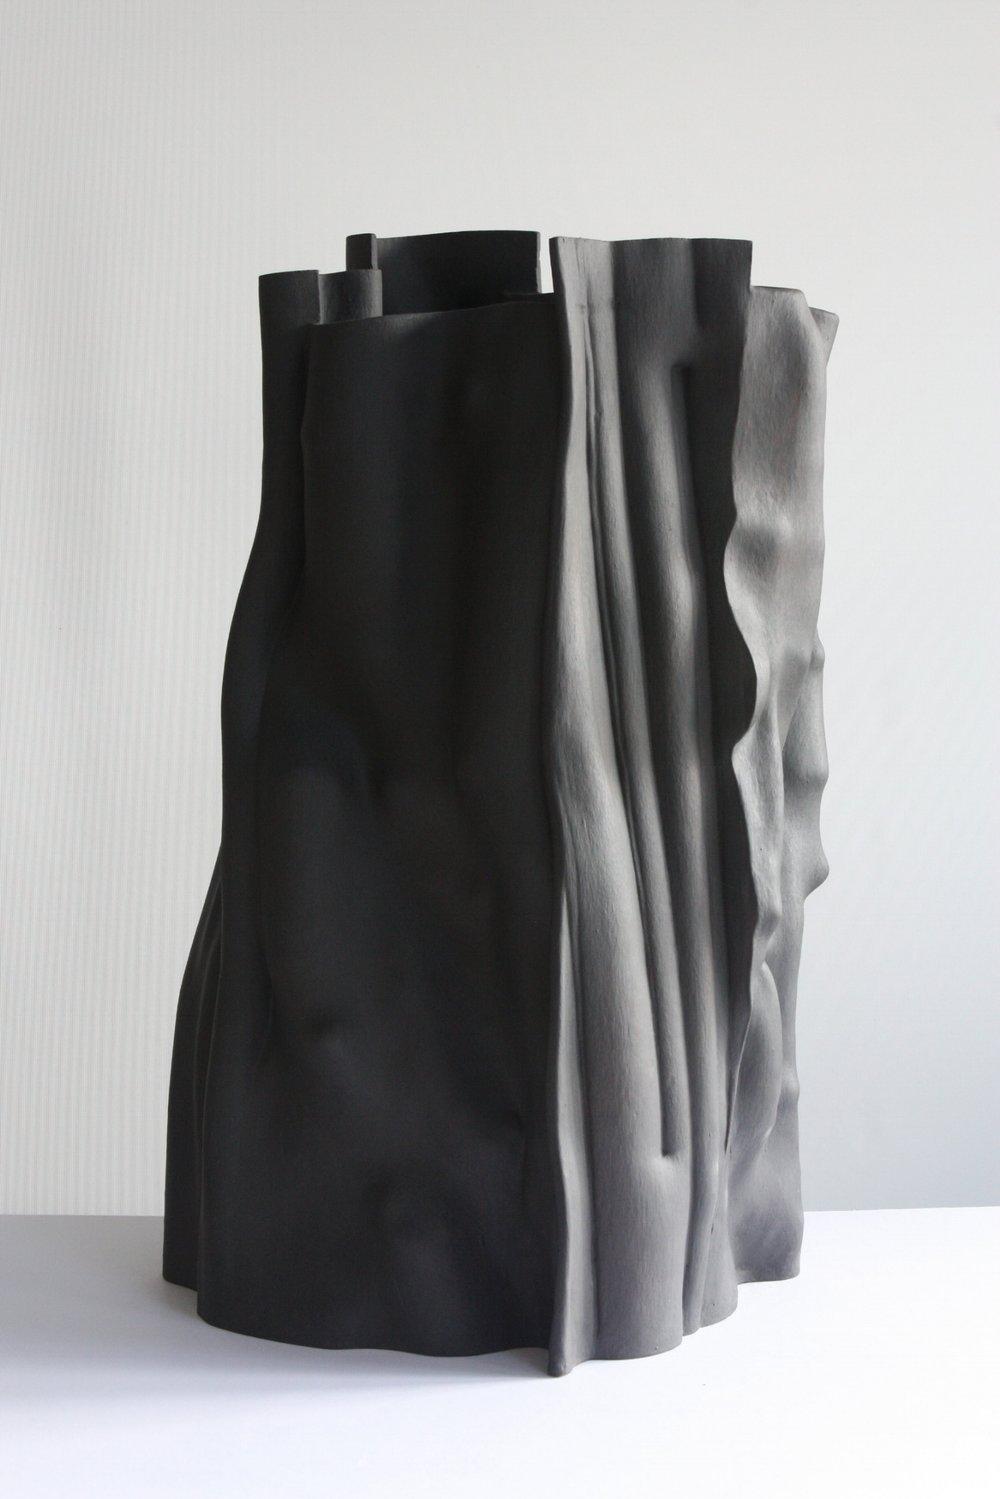 Alina, 2015, 64cm high